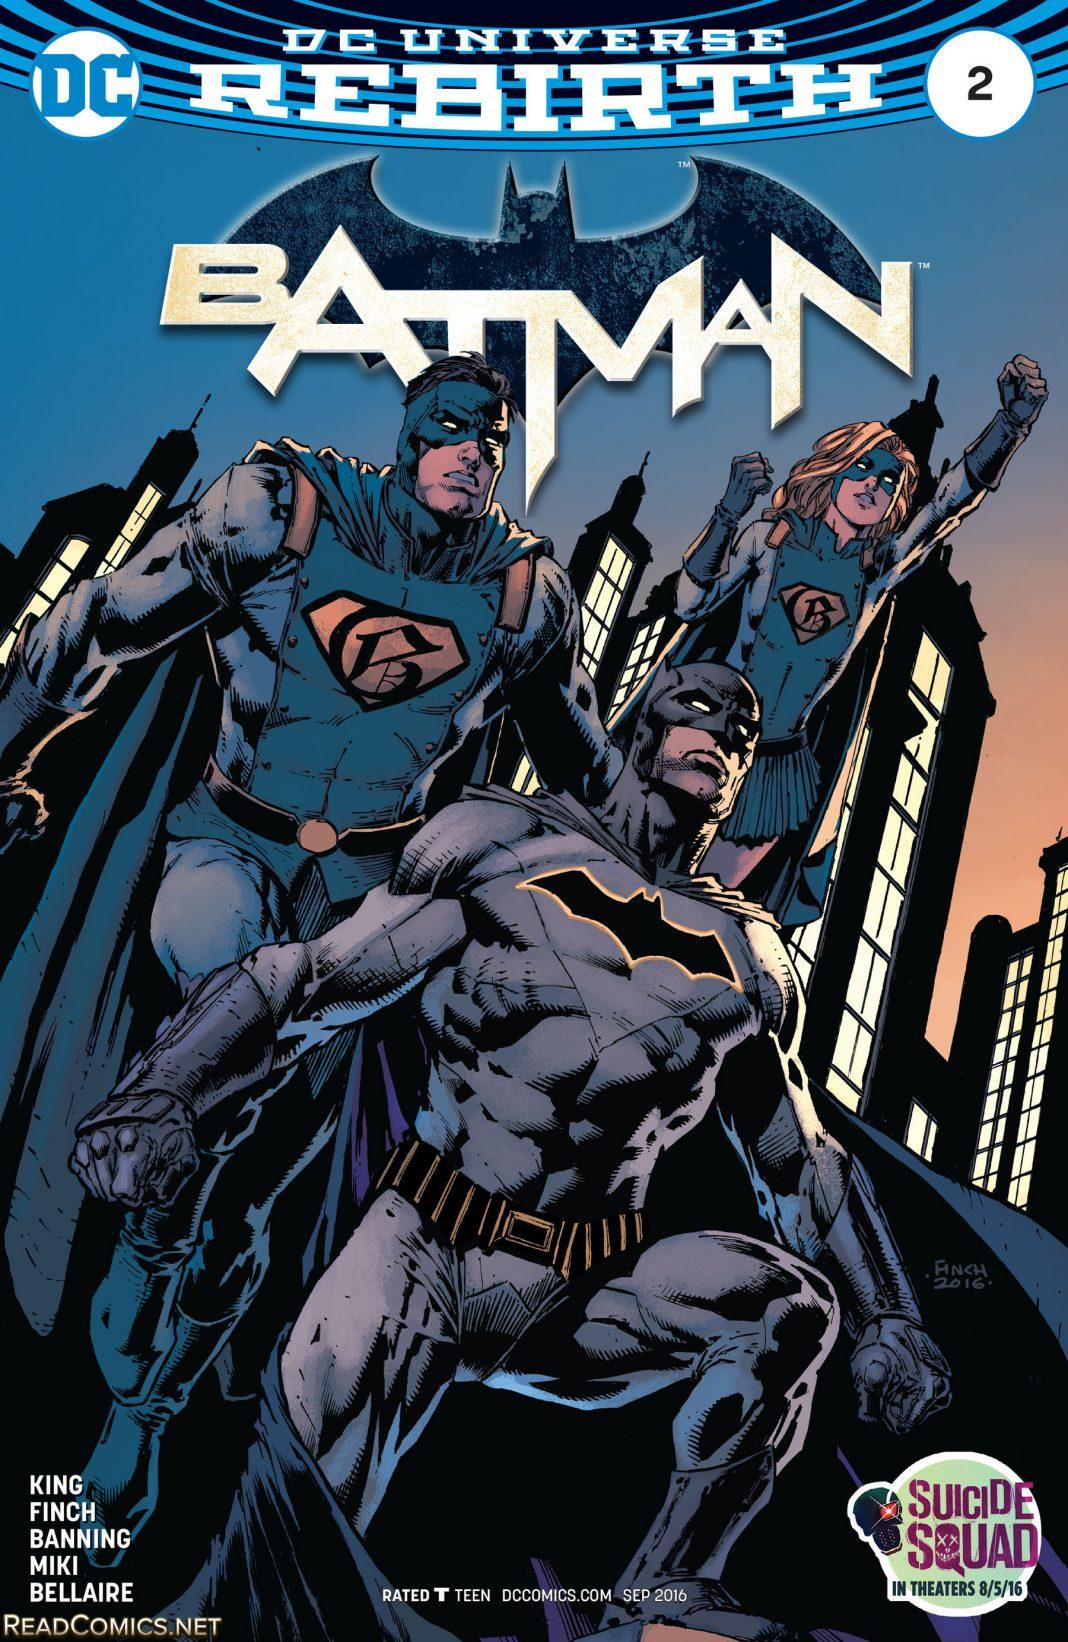 Batman #2 Review: Born on a Monday!